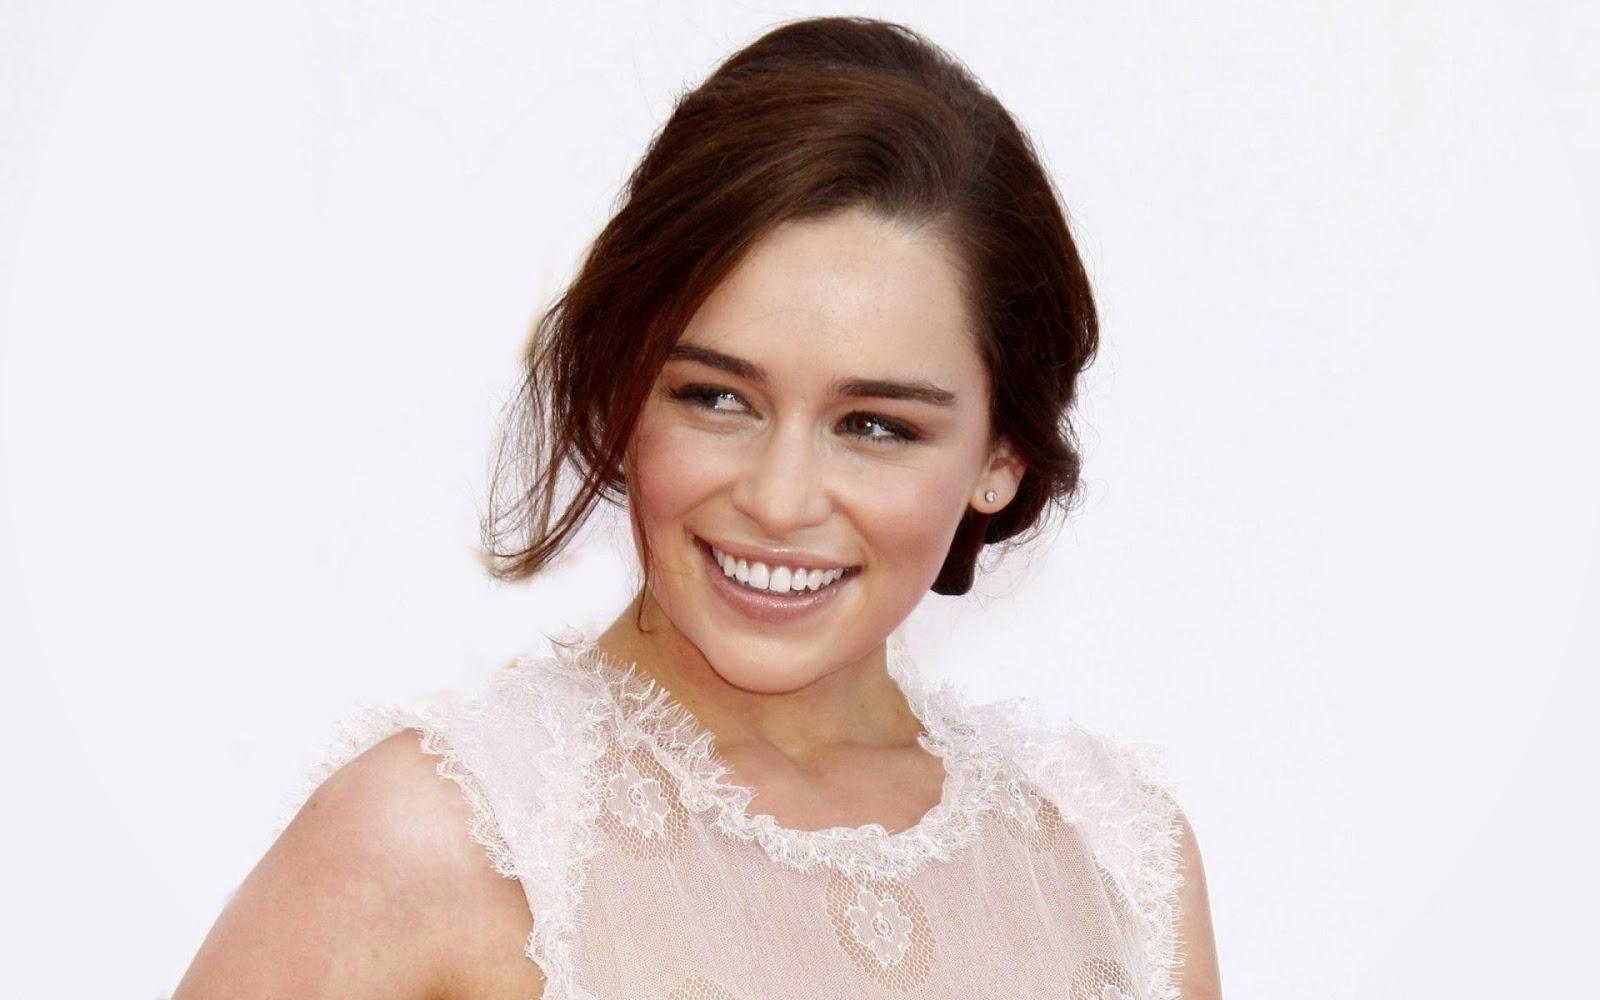 Hollywood actress hot Emilia clarke Cute smile photo